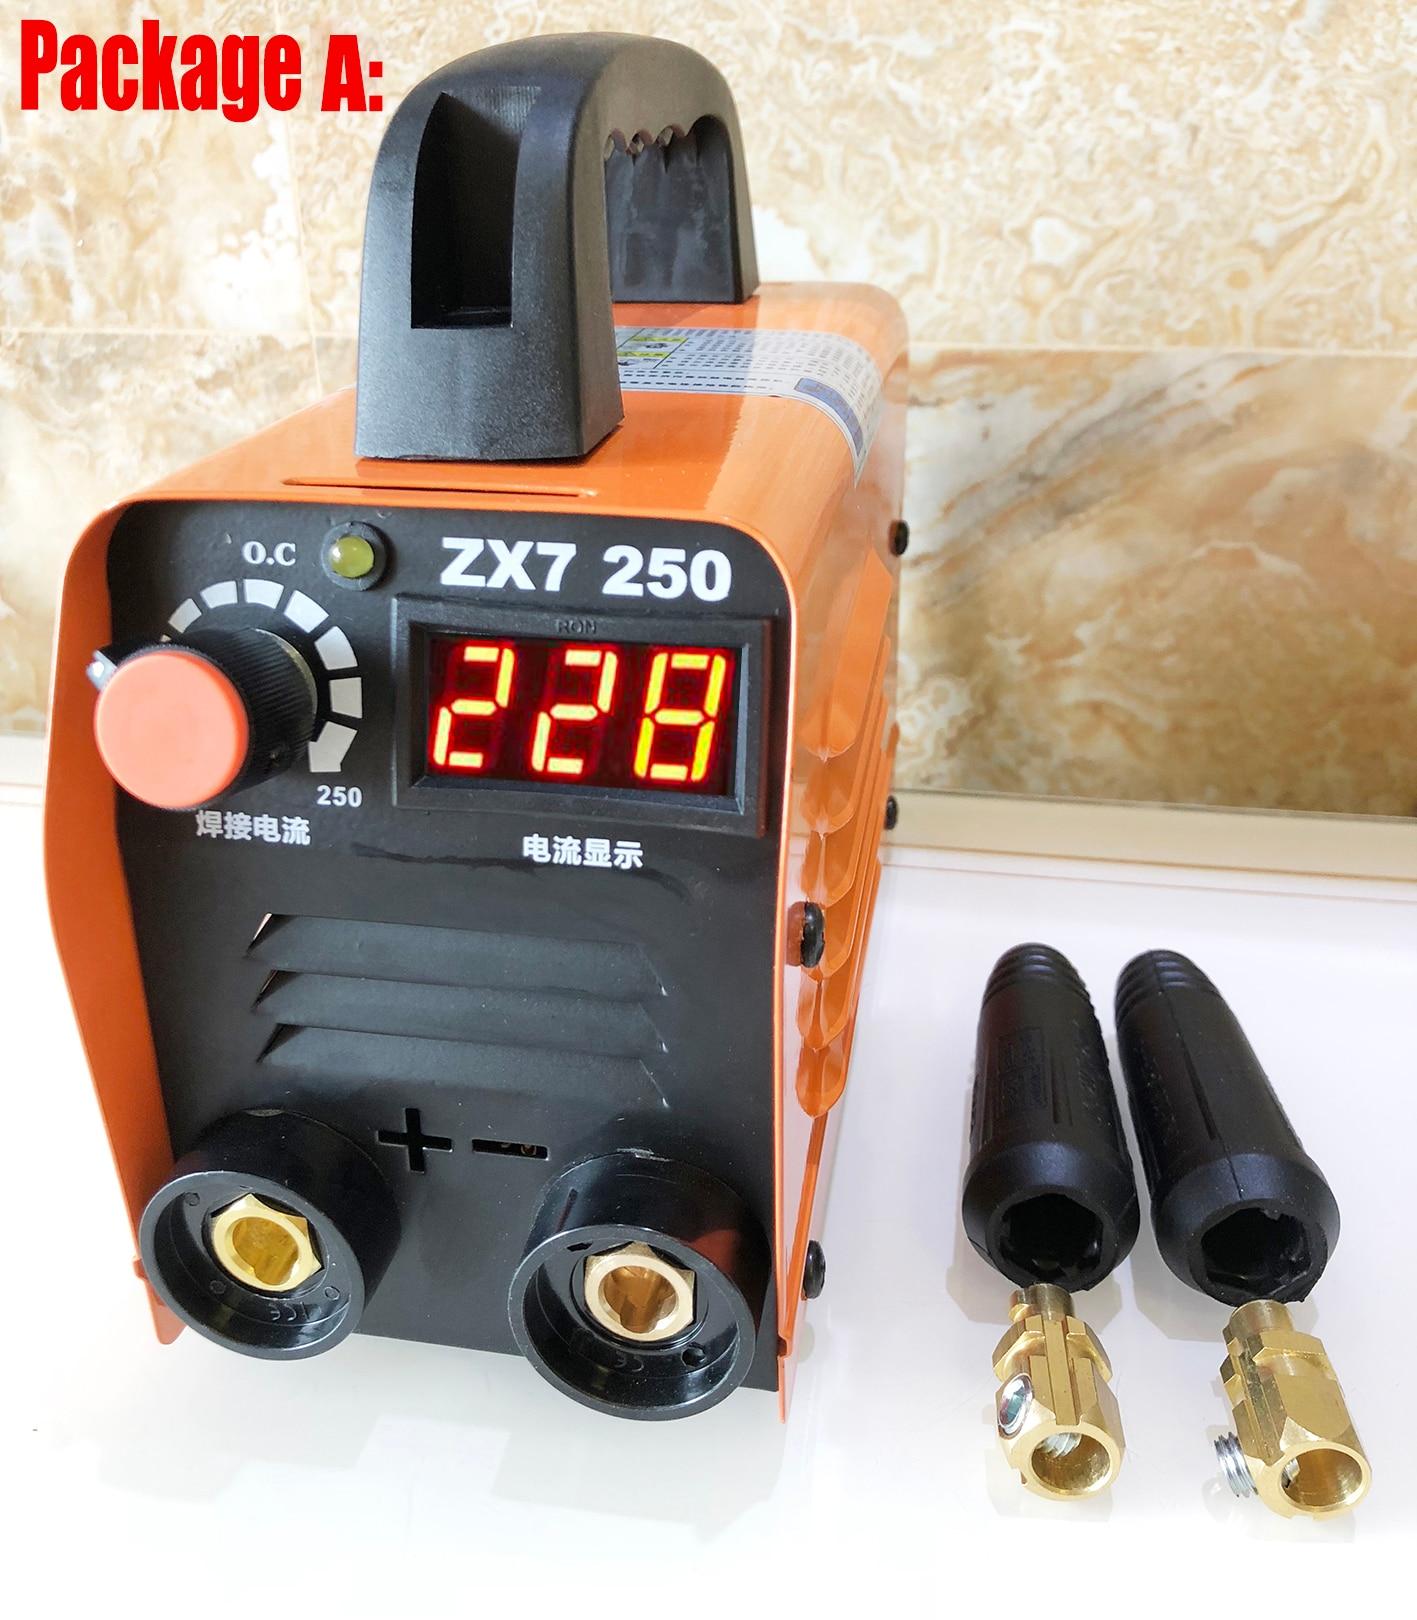 ZX7-250 Mini Welding Machine ARC Welder 220V MMA Welding Inverter Welding Semiautomatic Device